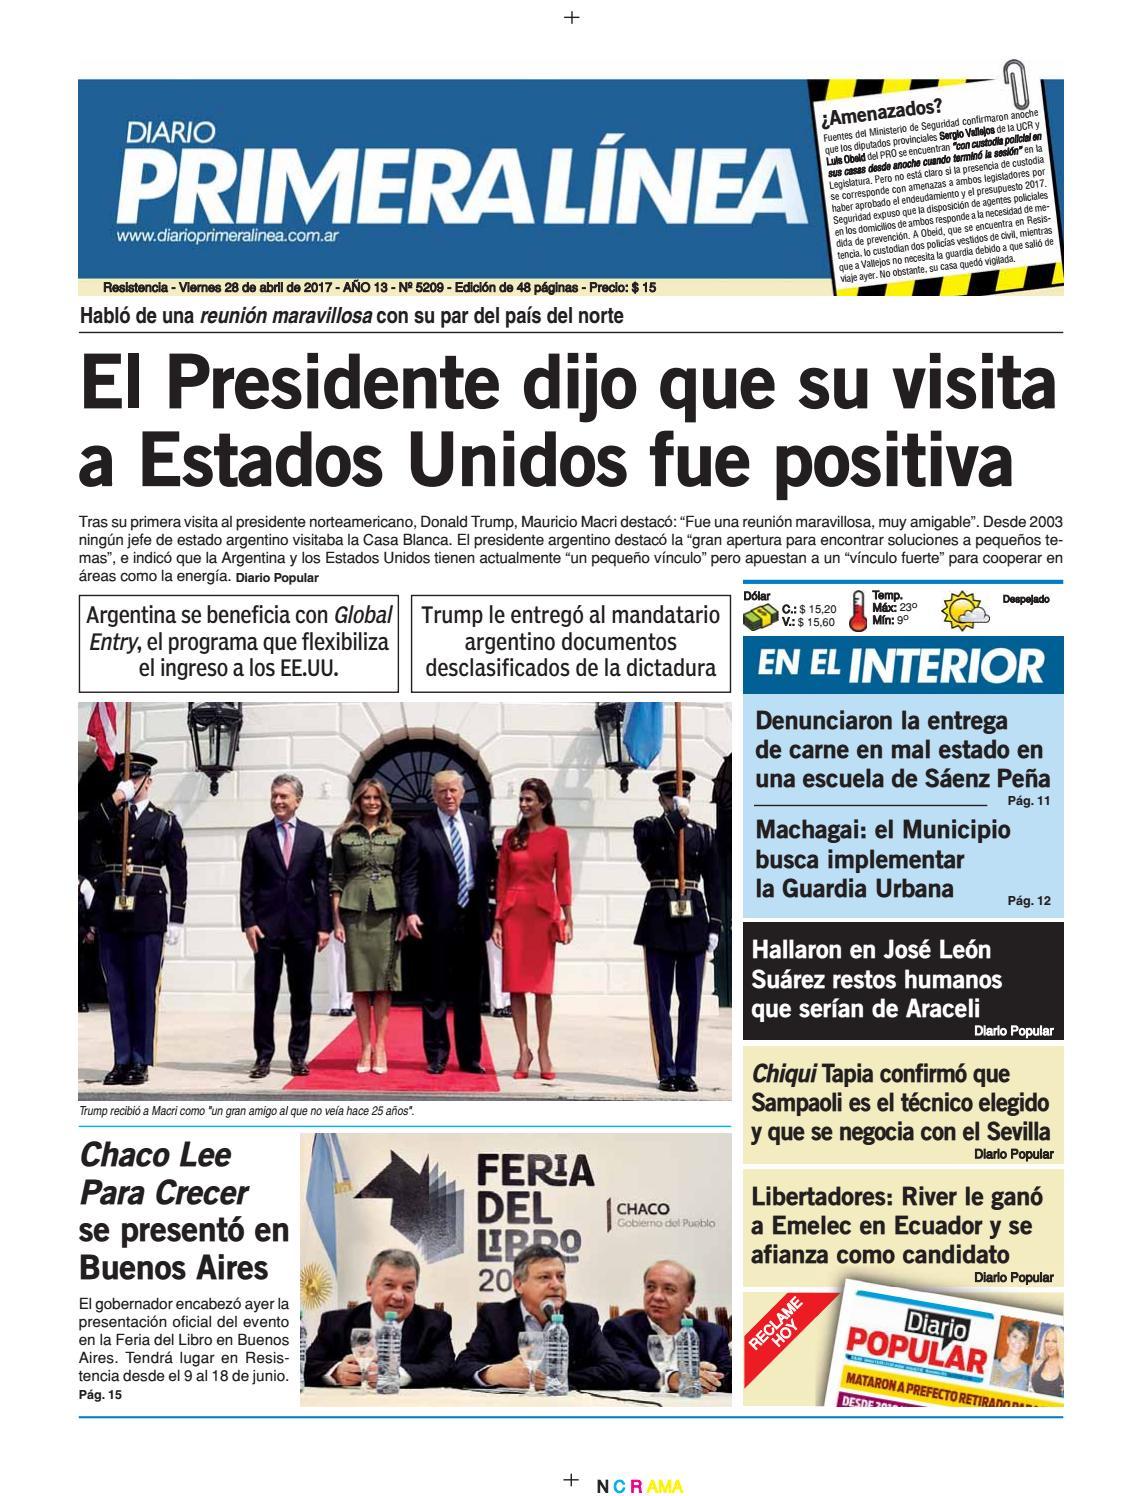 Primera Línea 5209 28 04 17 by Diario Primera Linea - issuu